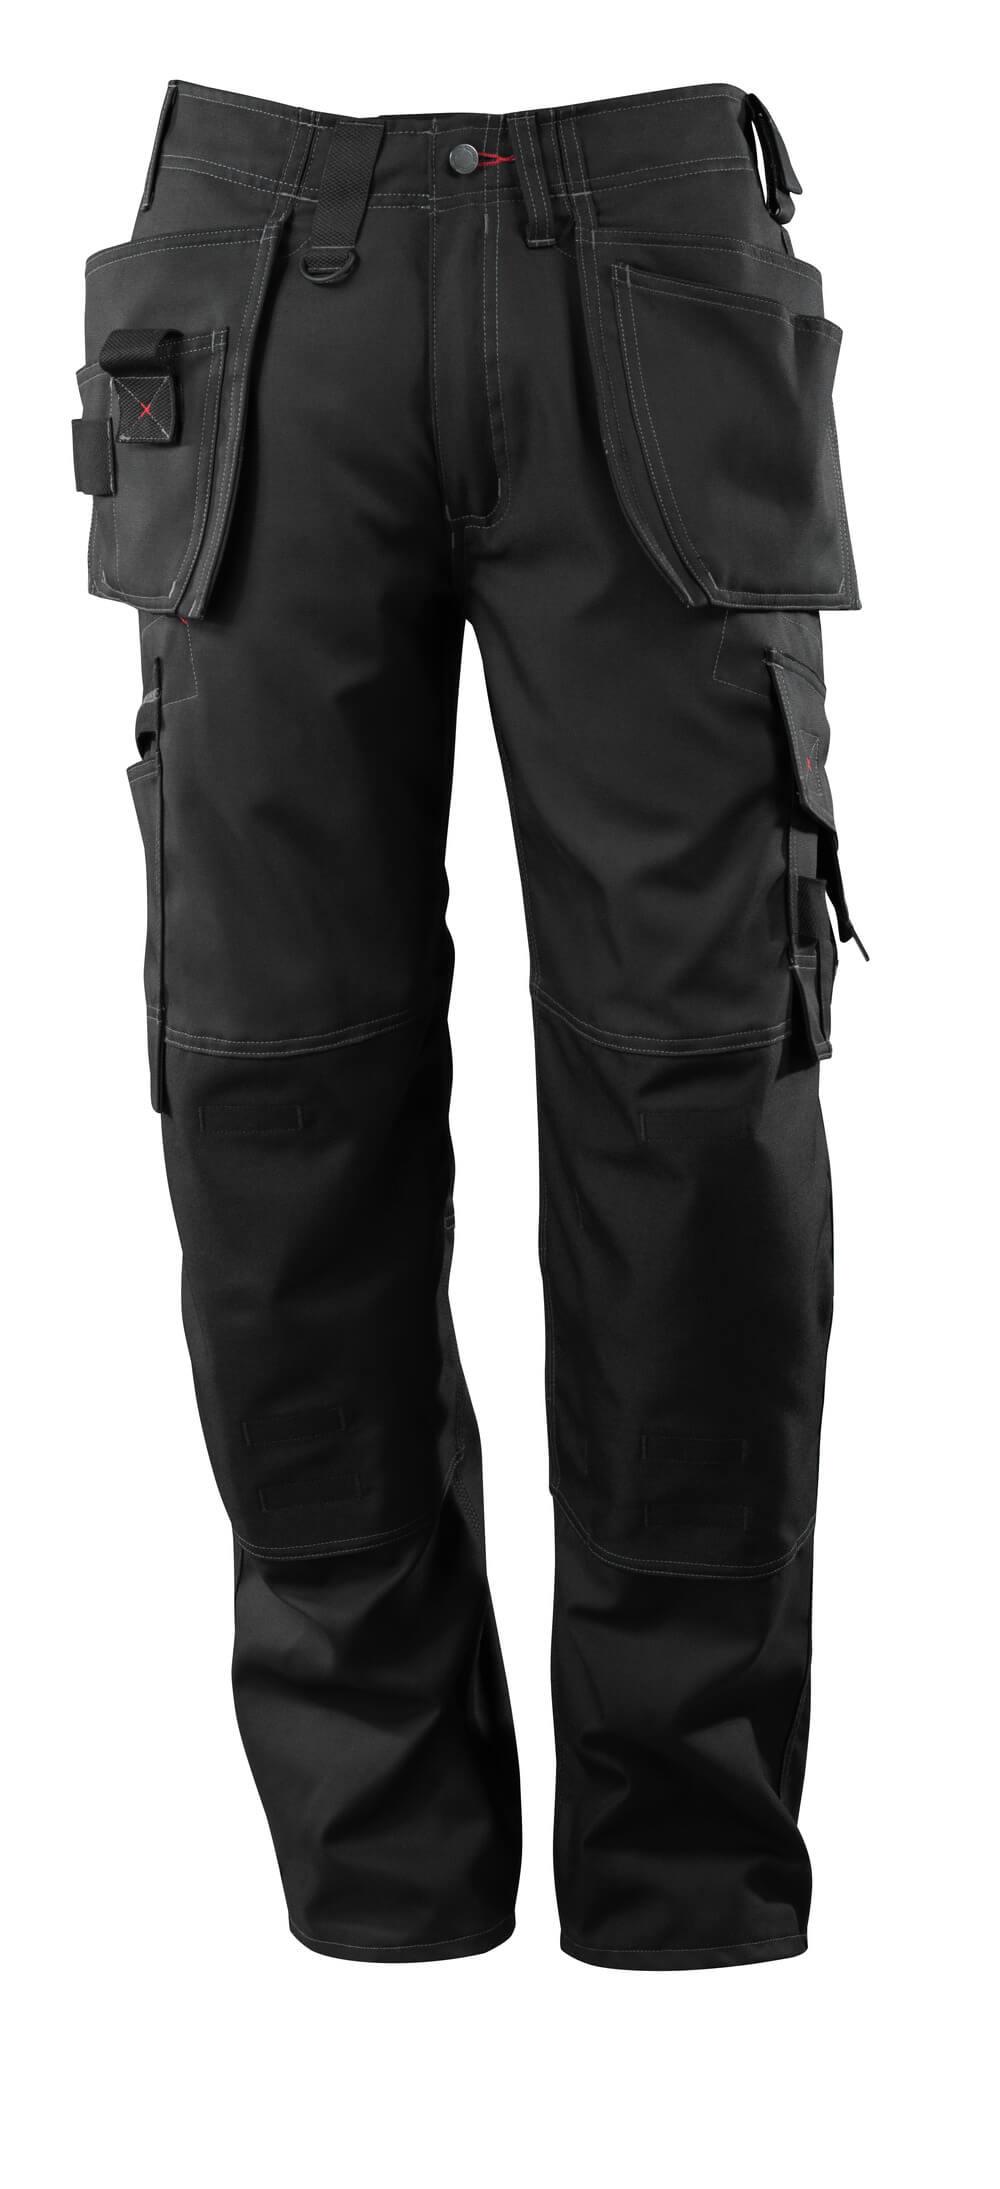 07379-154-09 Pantalon avec poches flottantes - Noir